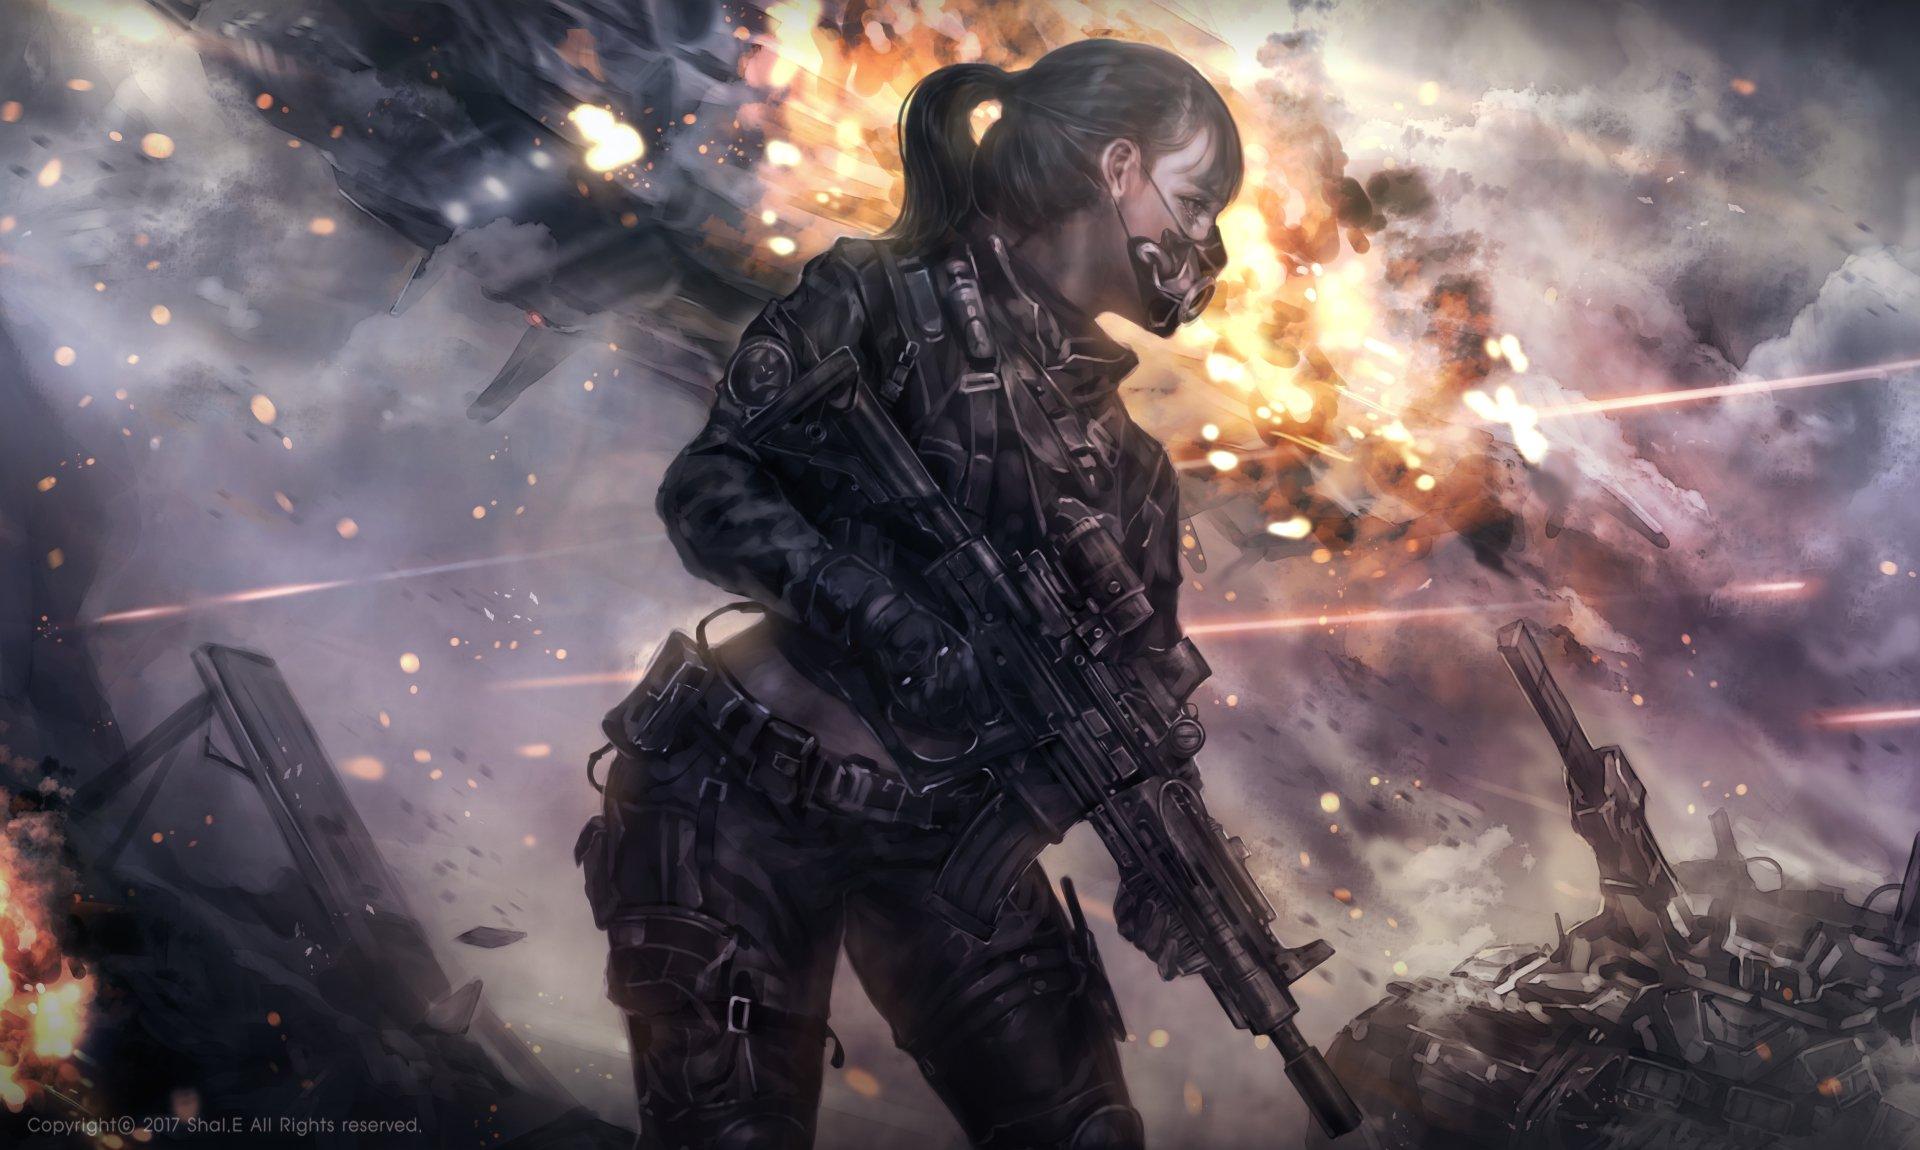 Anime - Original  Explosion Girl Gun Armor Warzone Ponytail Wallpaper